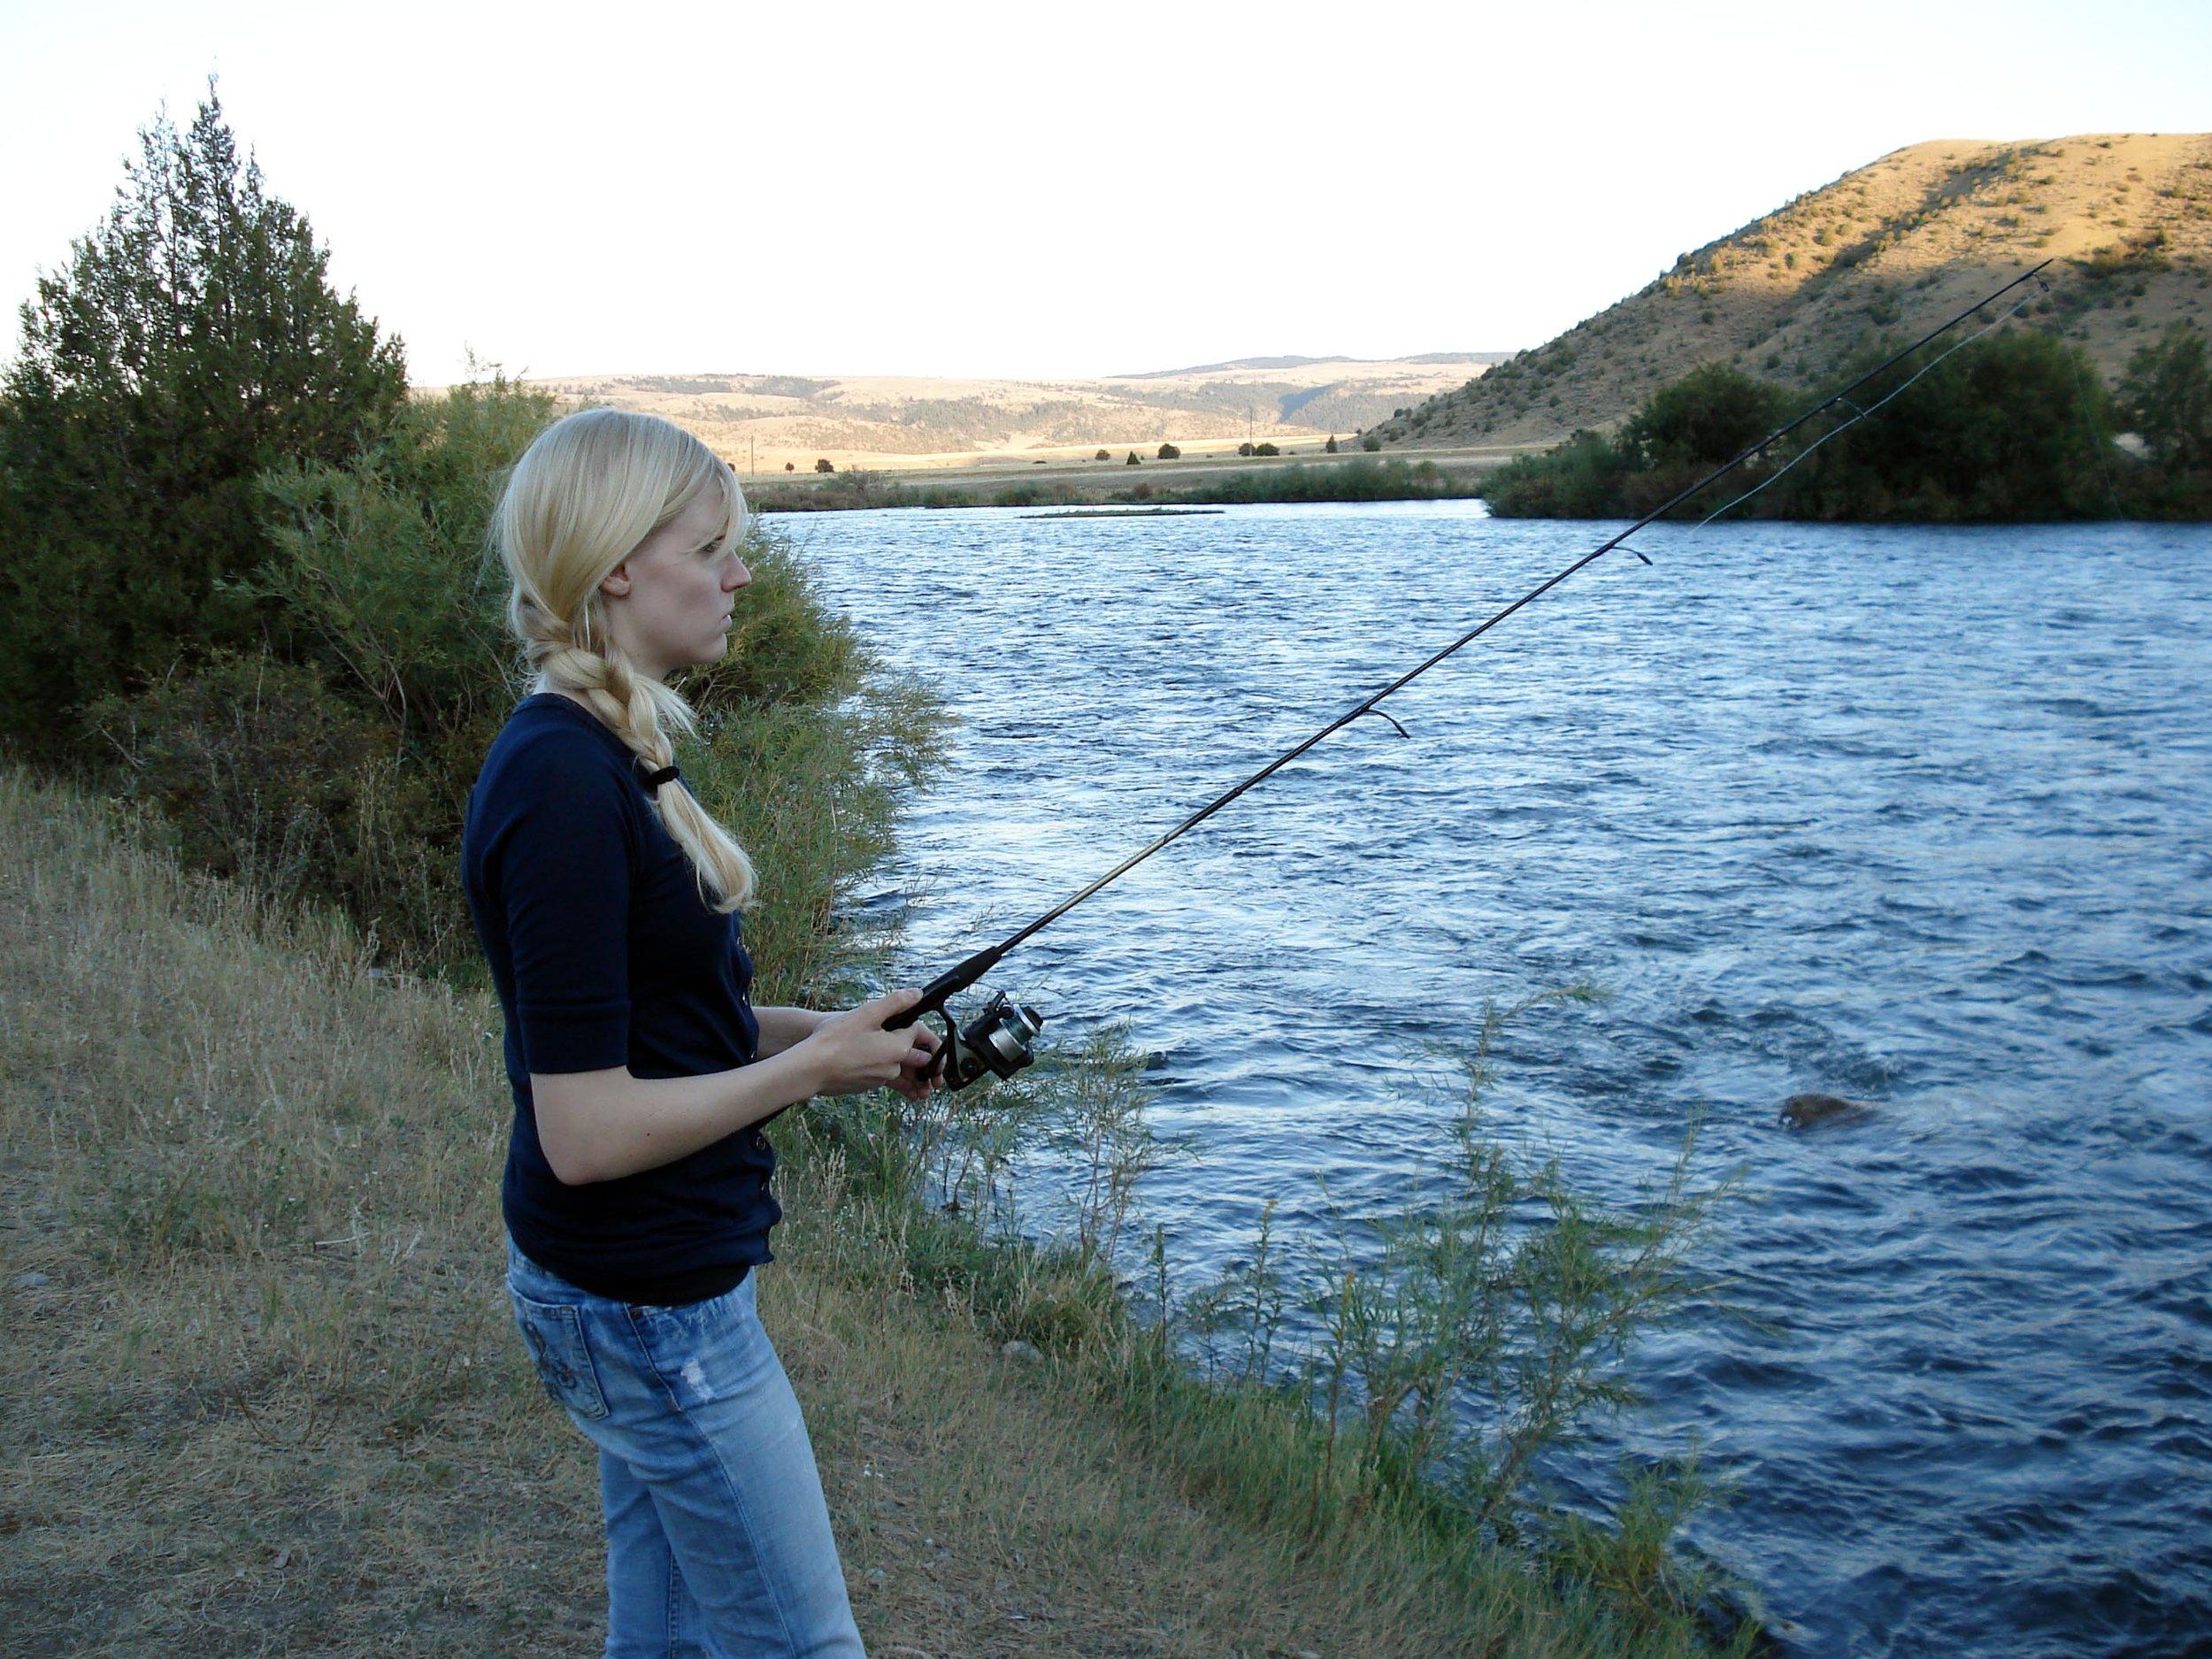 Camping on the Madison River near Bozeman, Montana